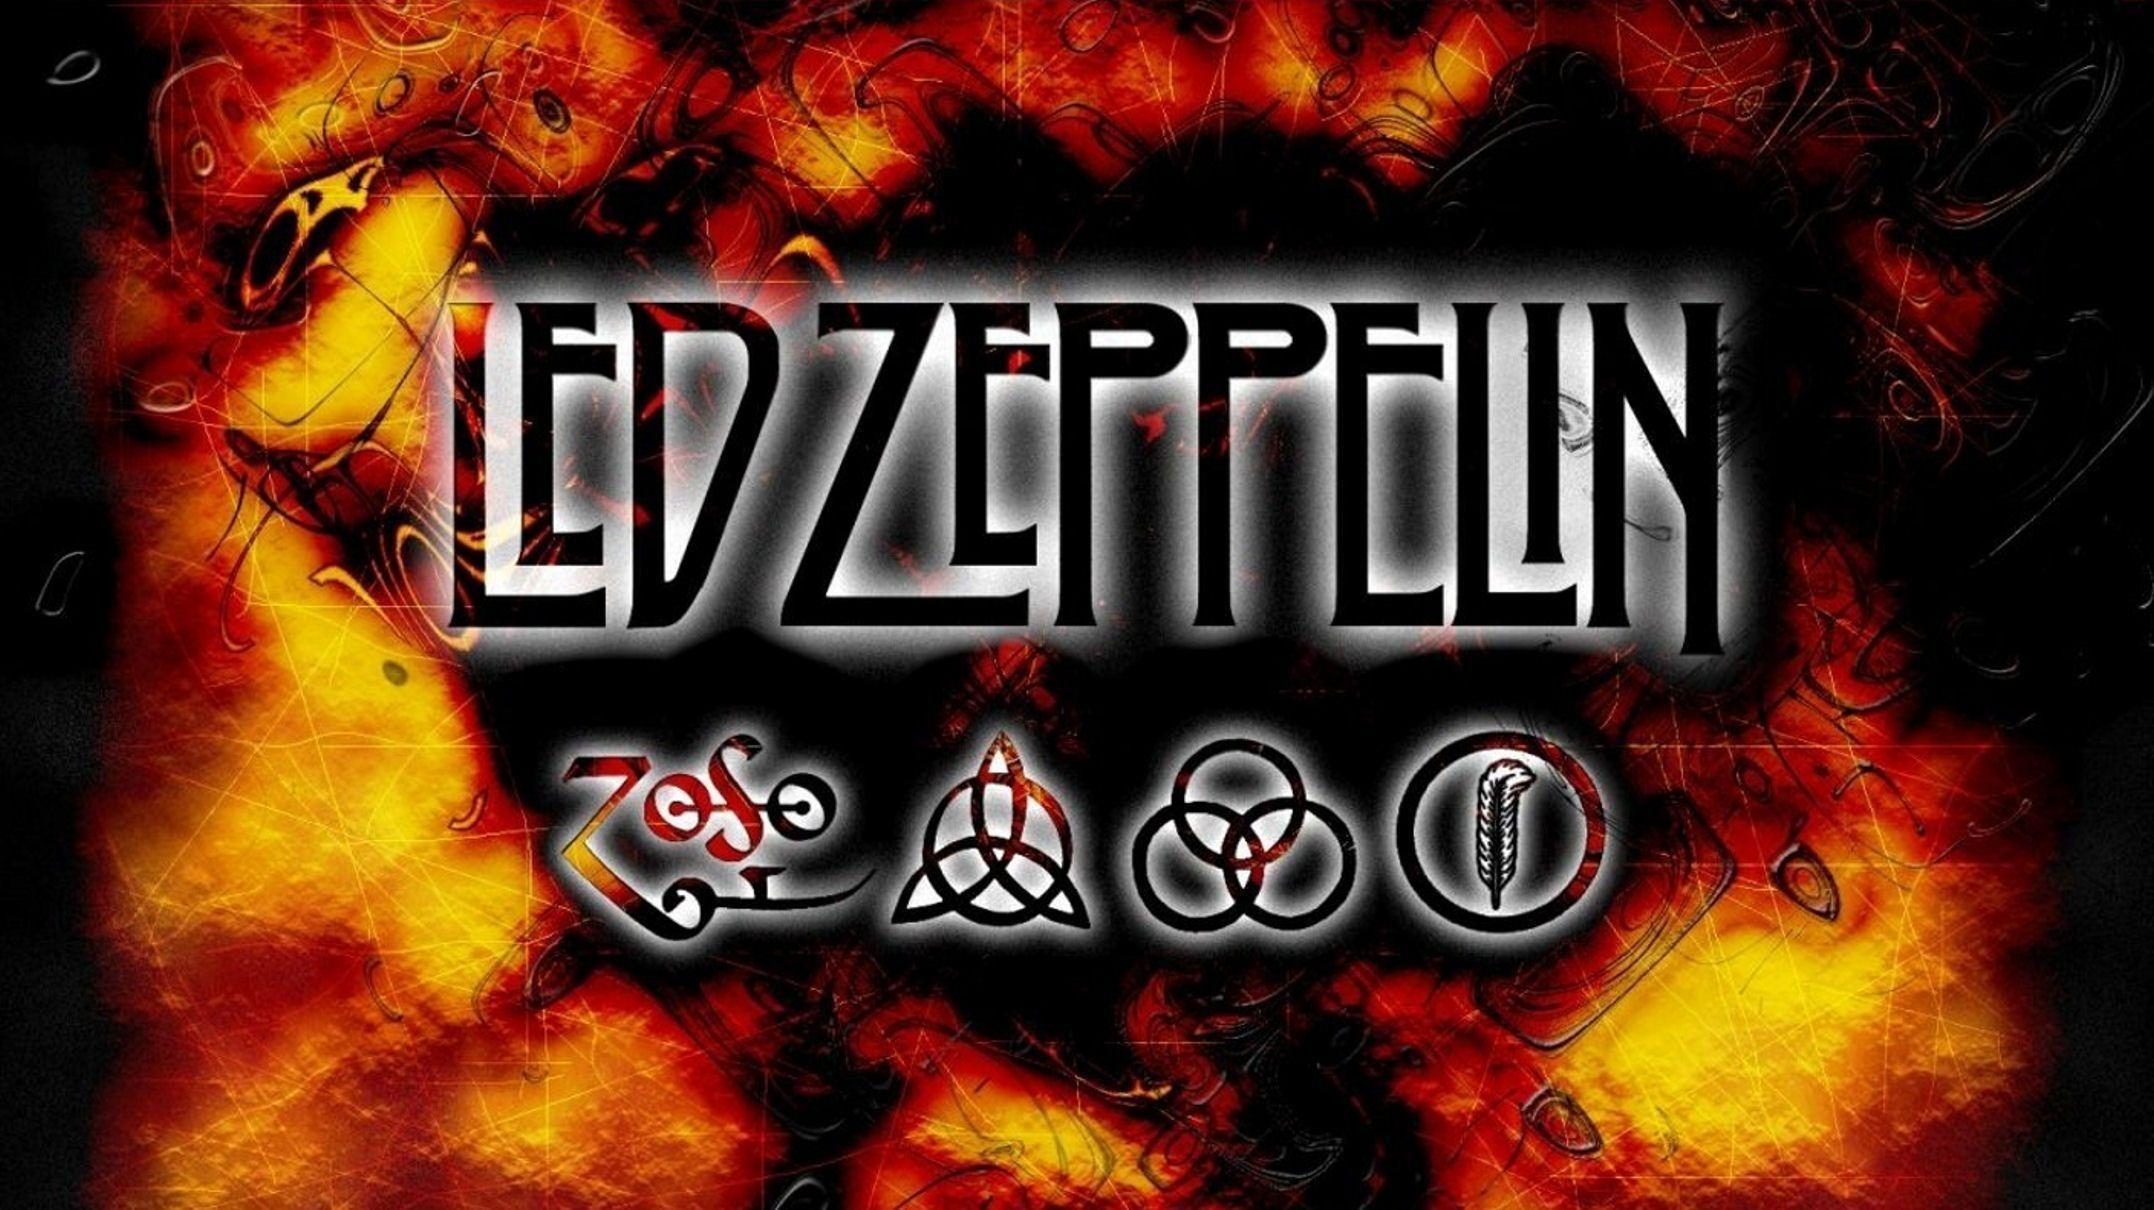 Led Zeppelin Backgrounds - Wallpaper Cave